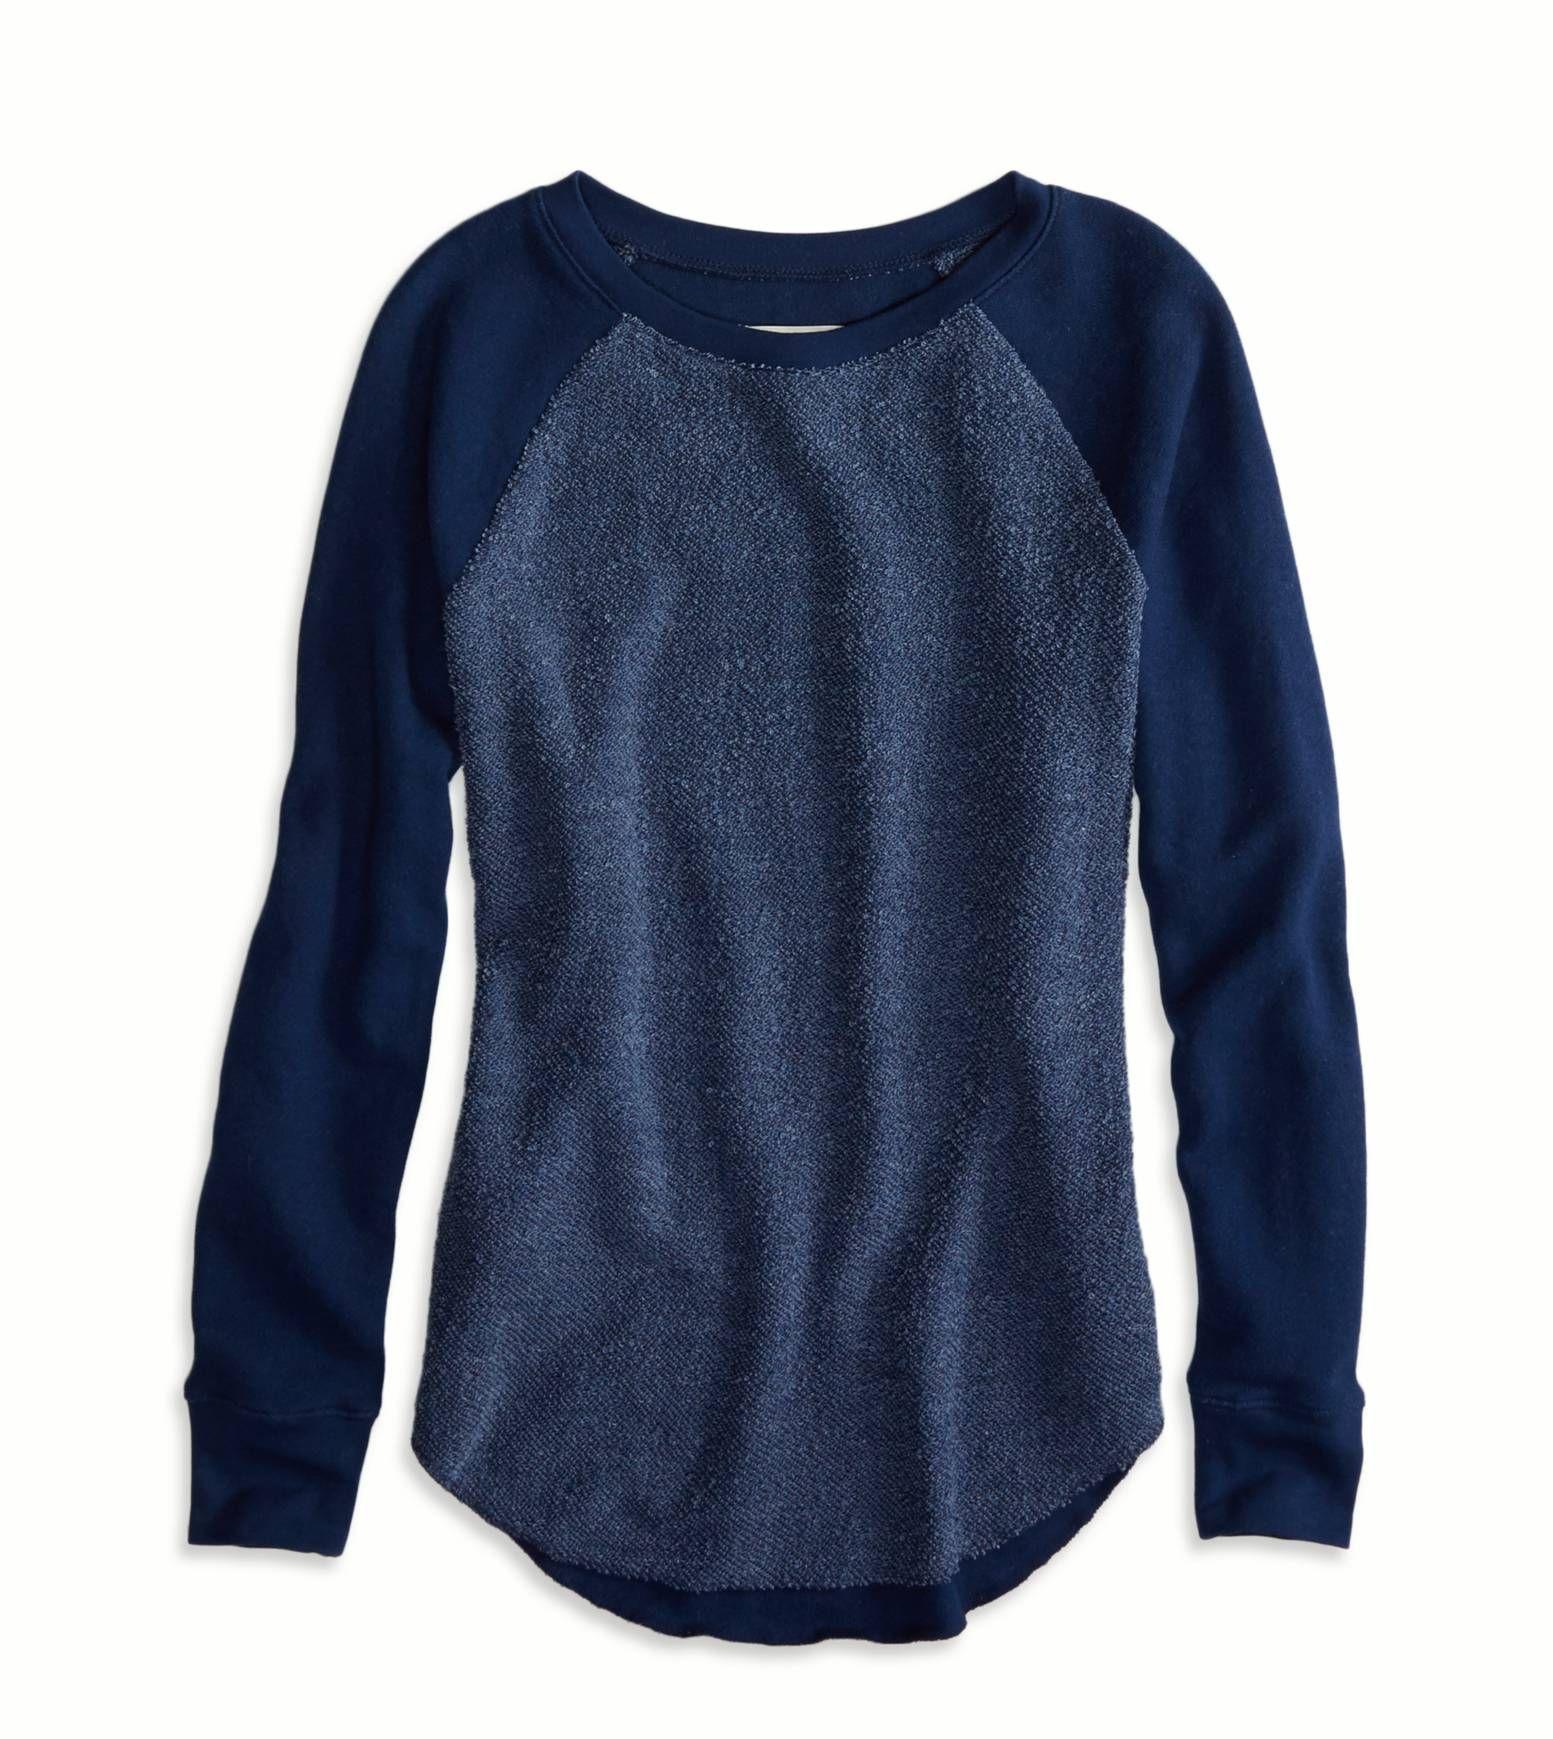 9c48c03c Navy AEO Factory Tonal Raglan Sweatshirt | Style <3 | American eagle ...